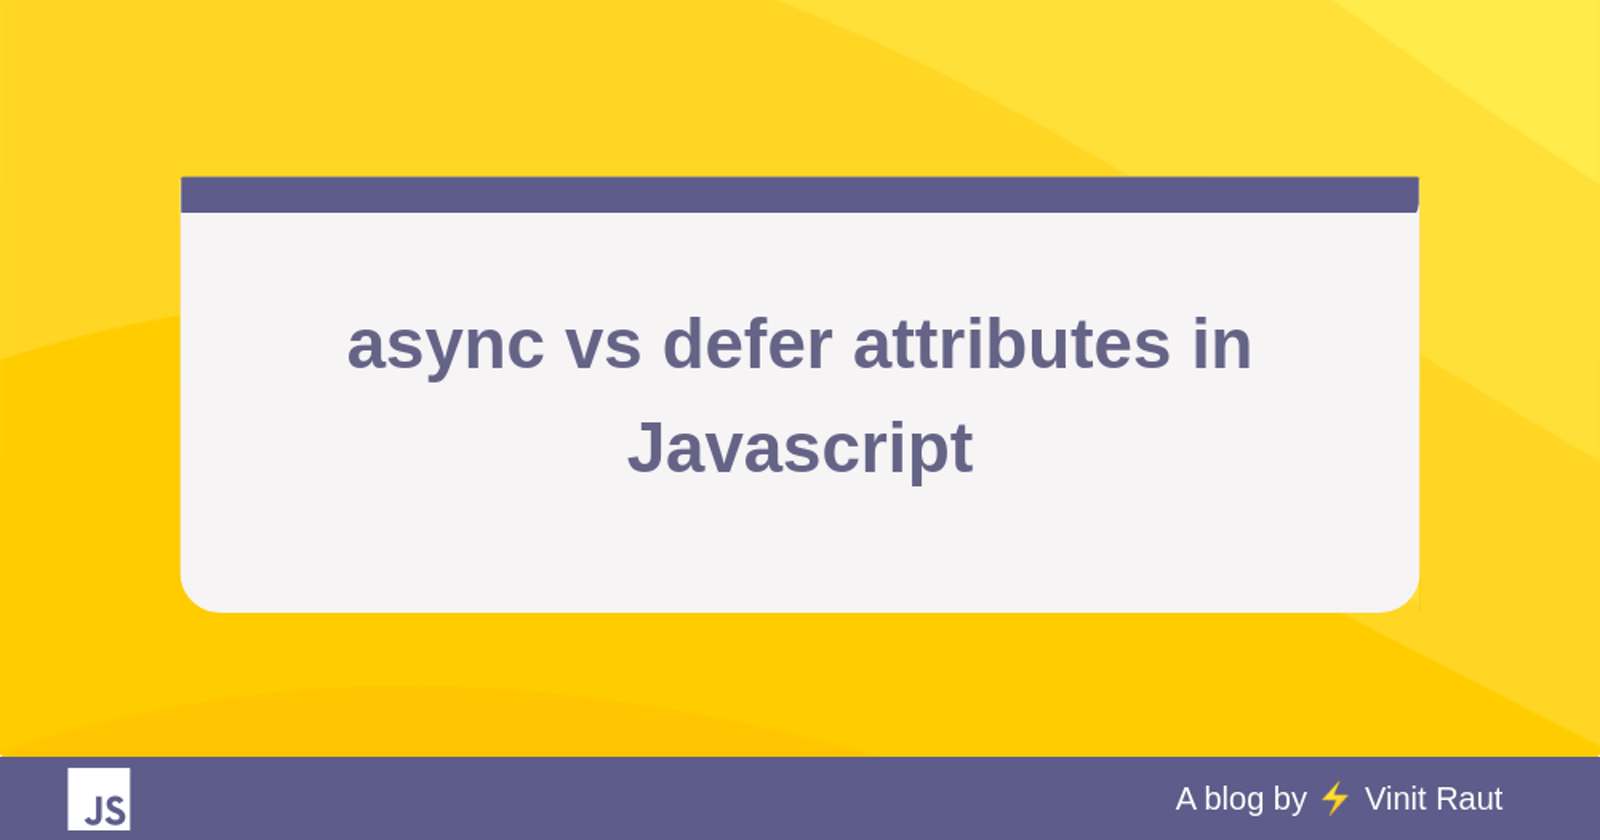 async vs defer attributes in Javascript